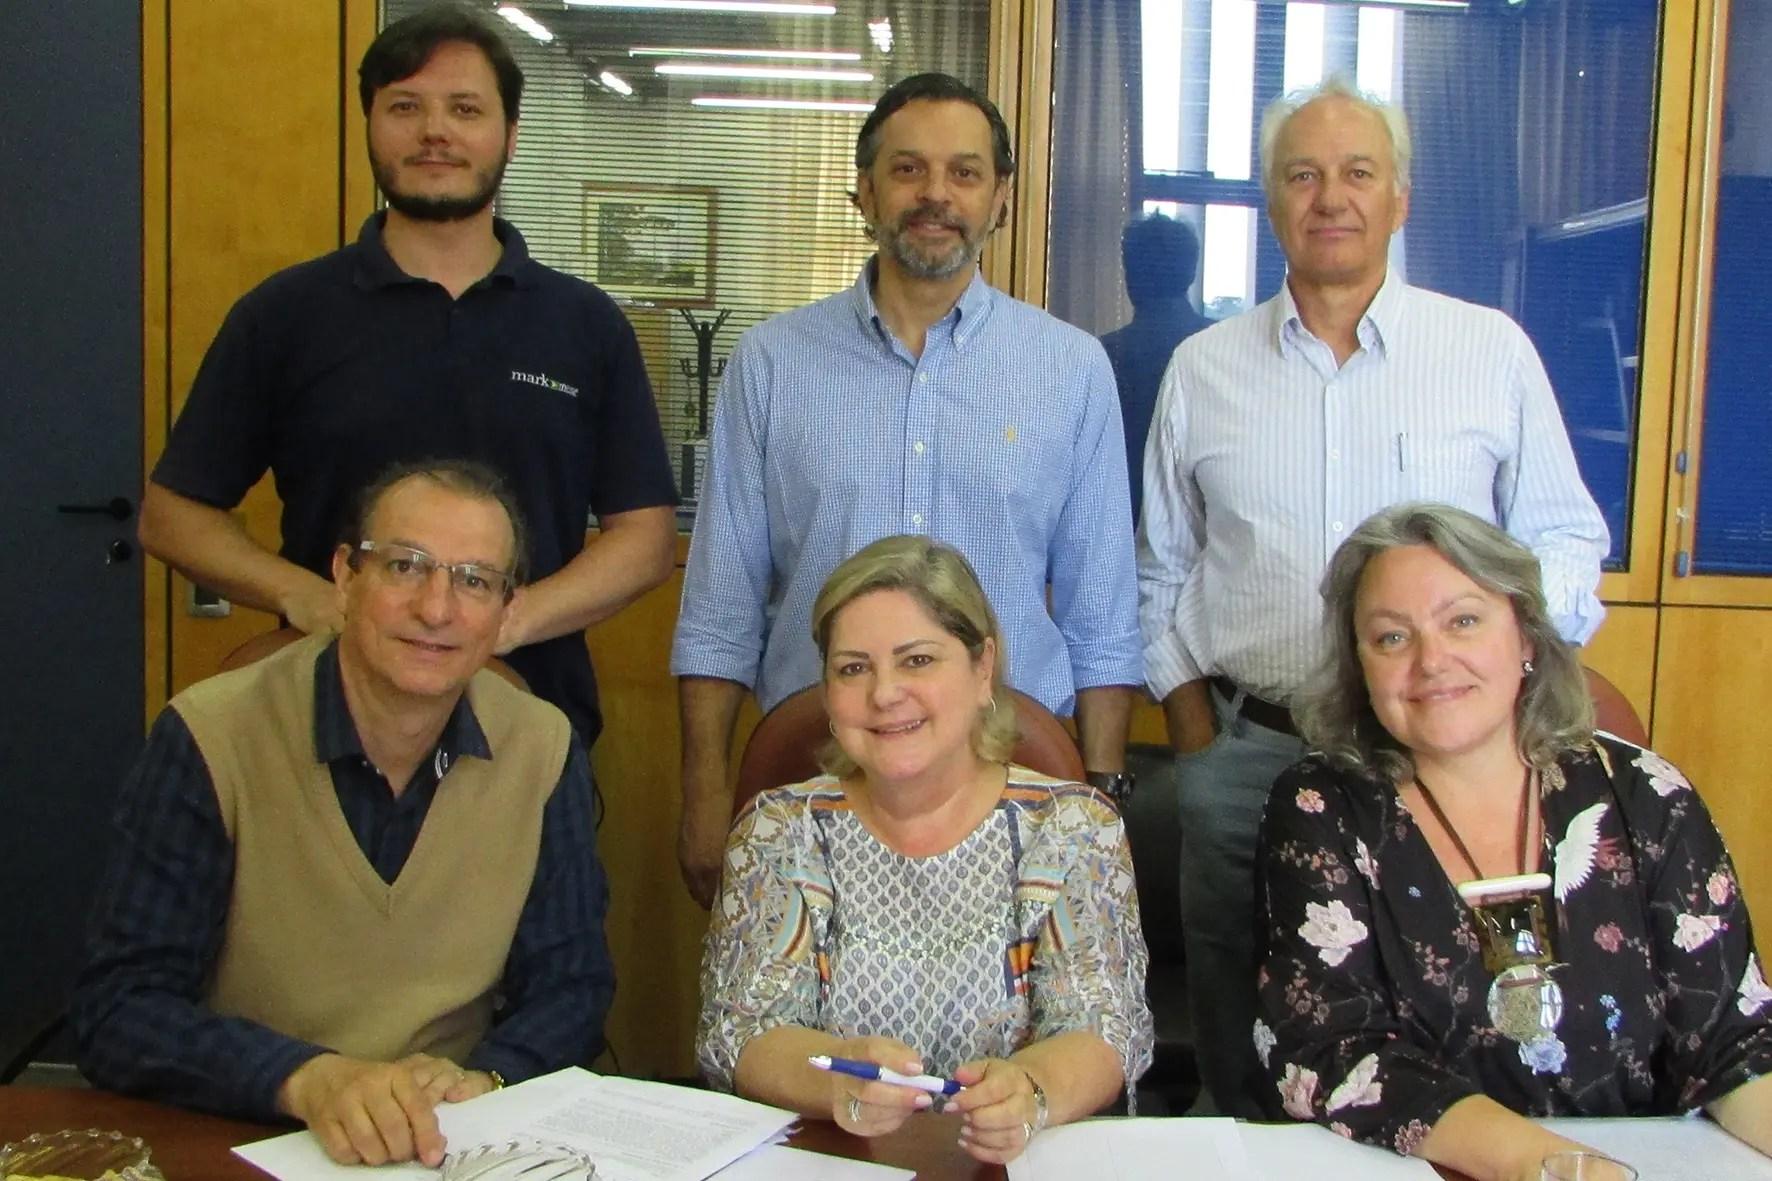 Top Tur - Prêmio Panorama do Turismo, o principal prêmiodo Paraná, já tem candidatos